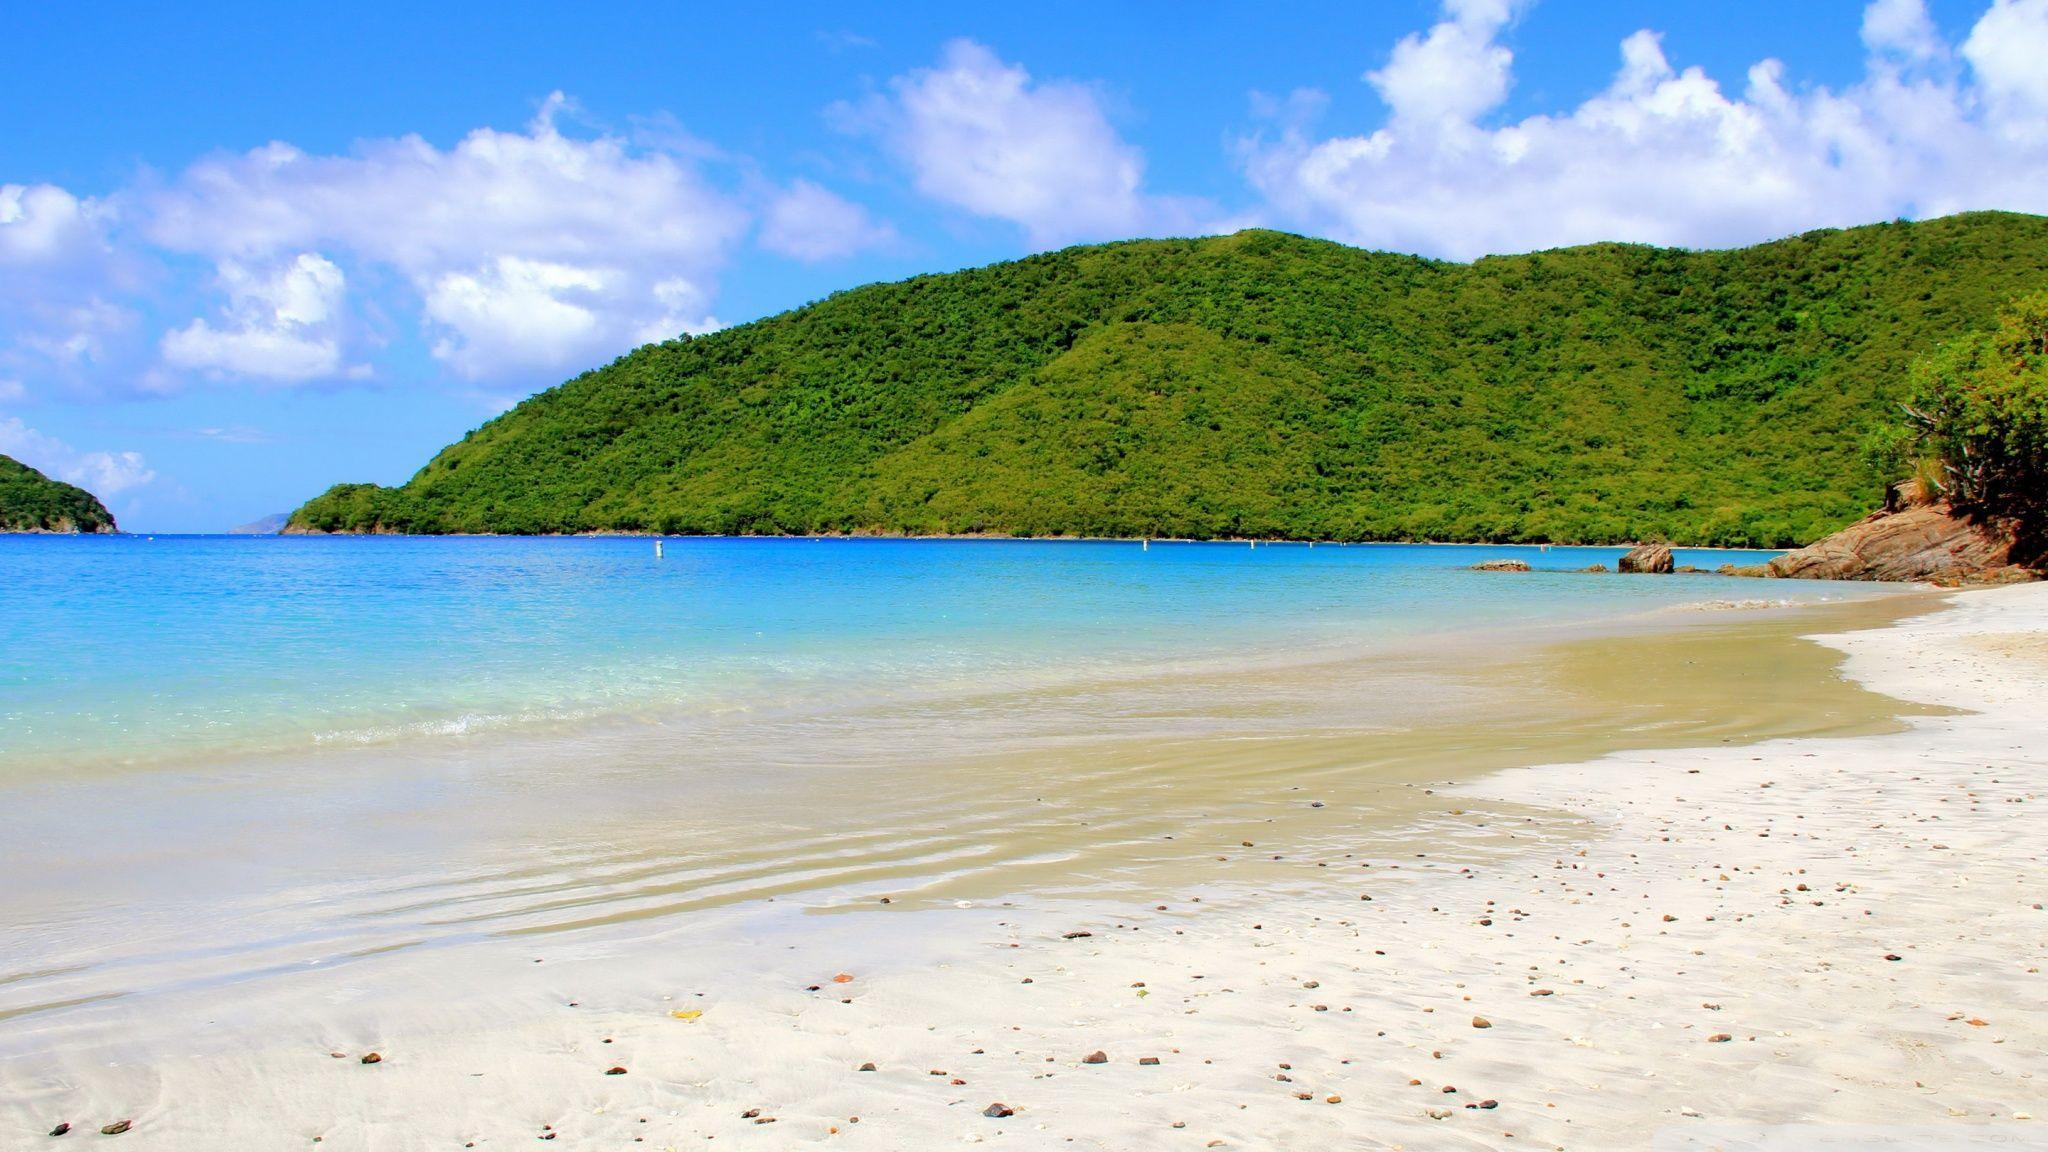 Caribbean Desktop Wallpapers Top Free Caribbean Desktop Backgrounds Wallpaperaccess